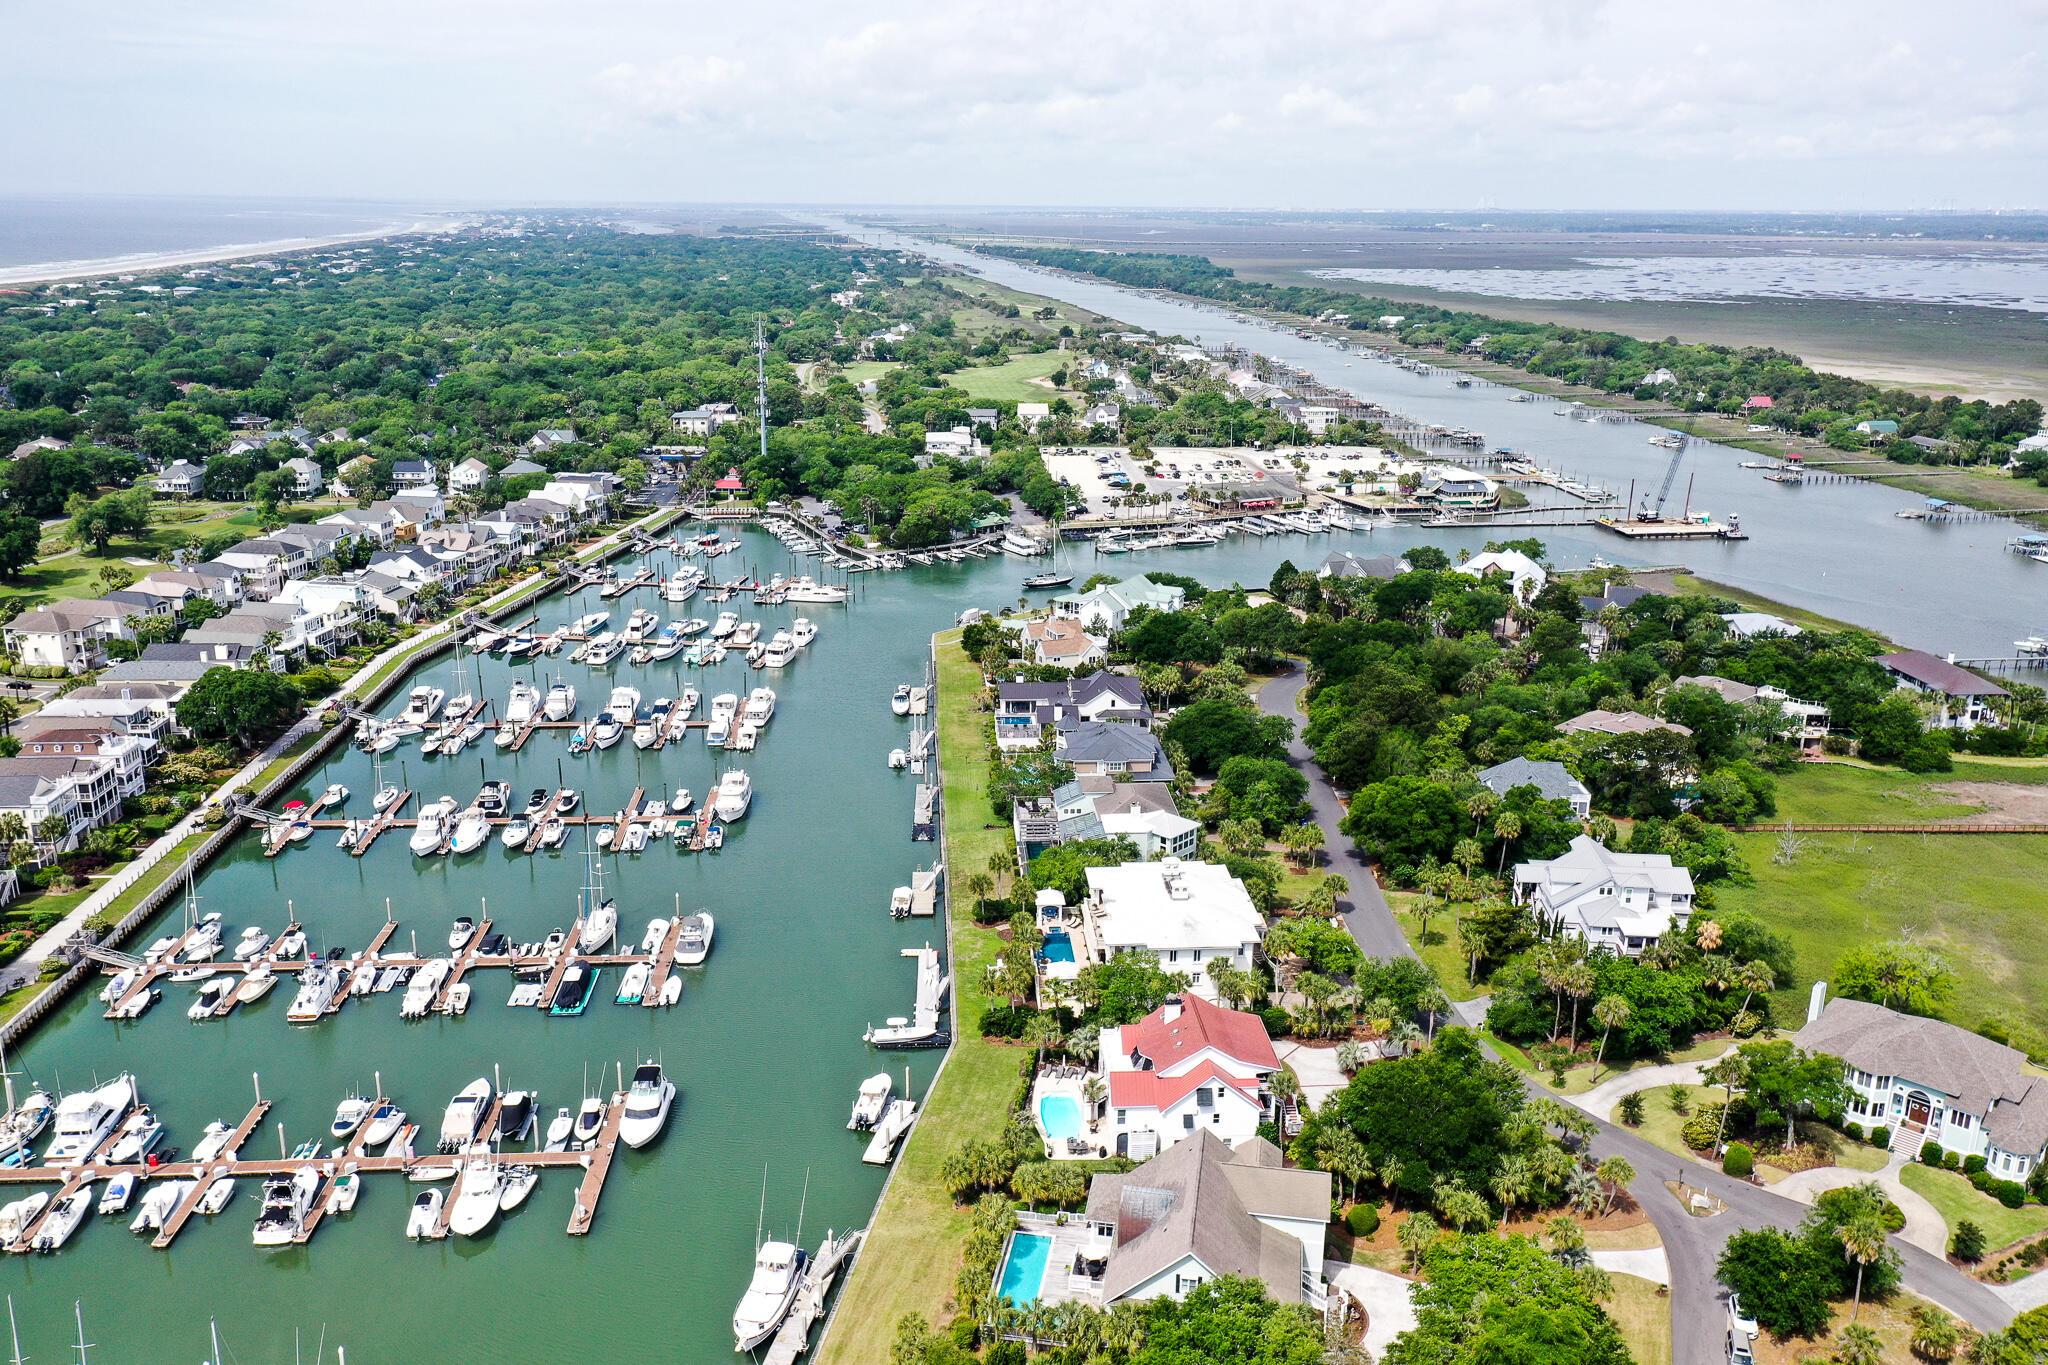 Waterway Island Homes For Sale - 42 Waterway Island Drive, Isle of Palms, SC - 31